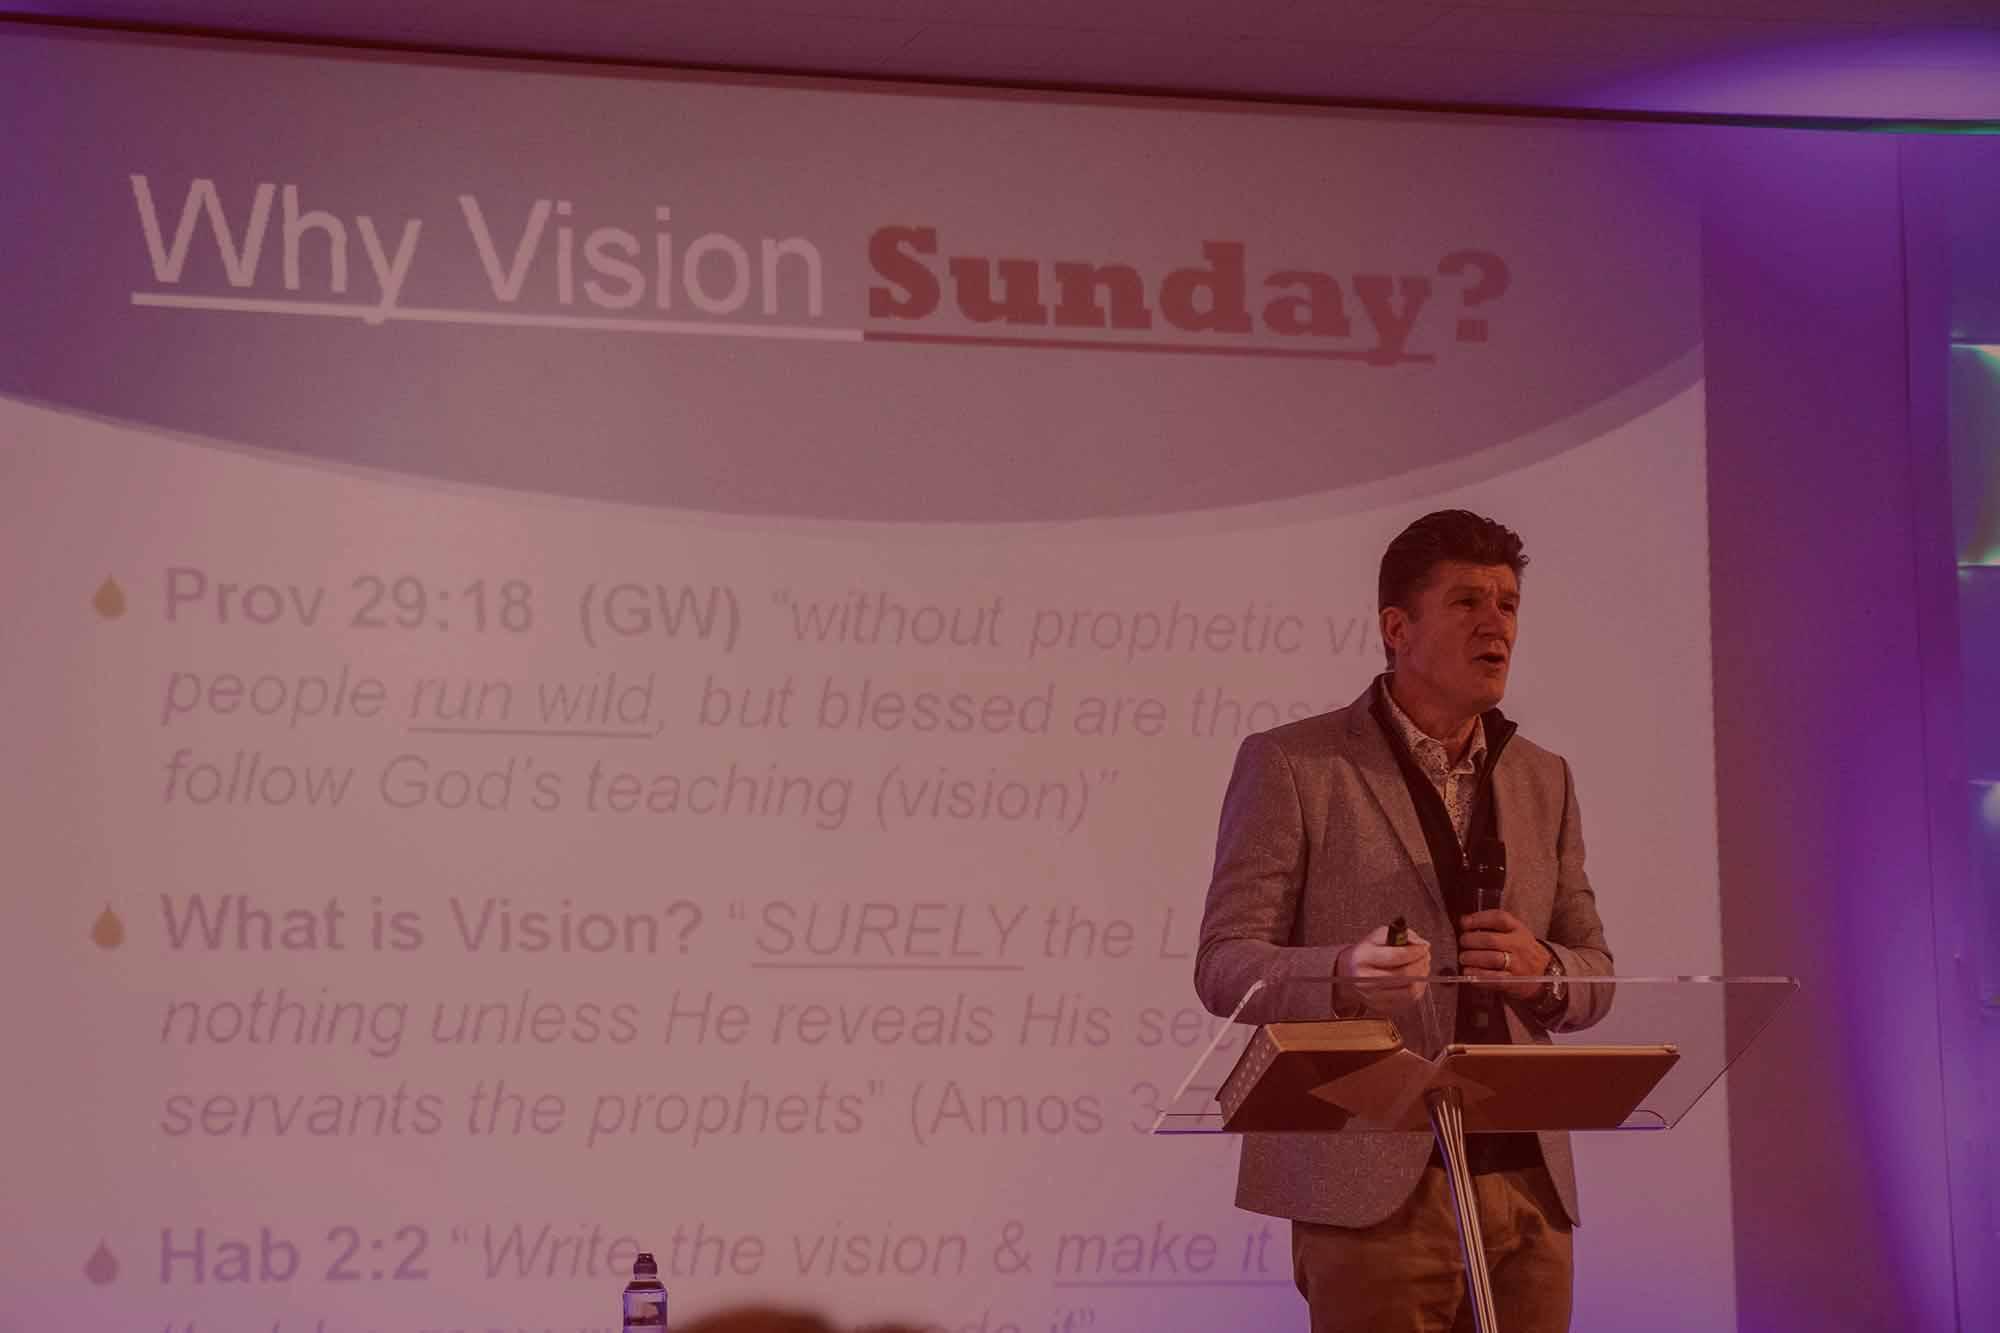 Pastor John Sharing Vision